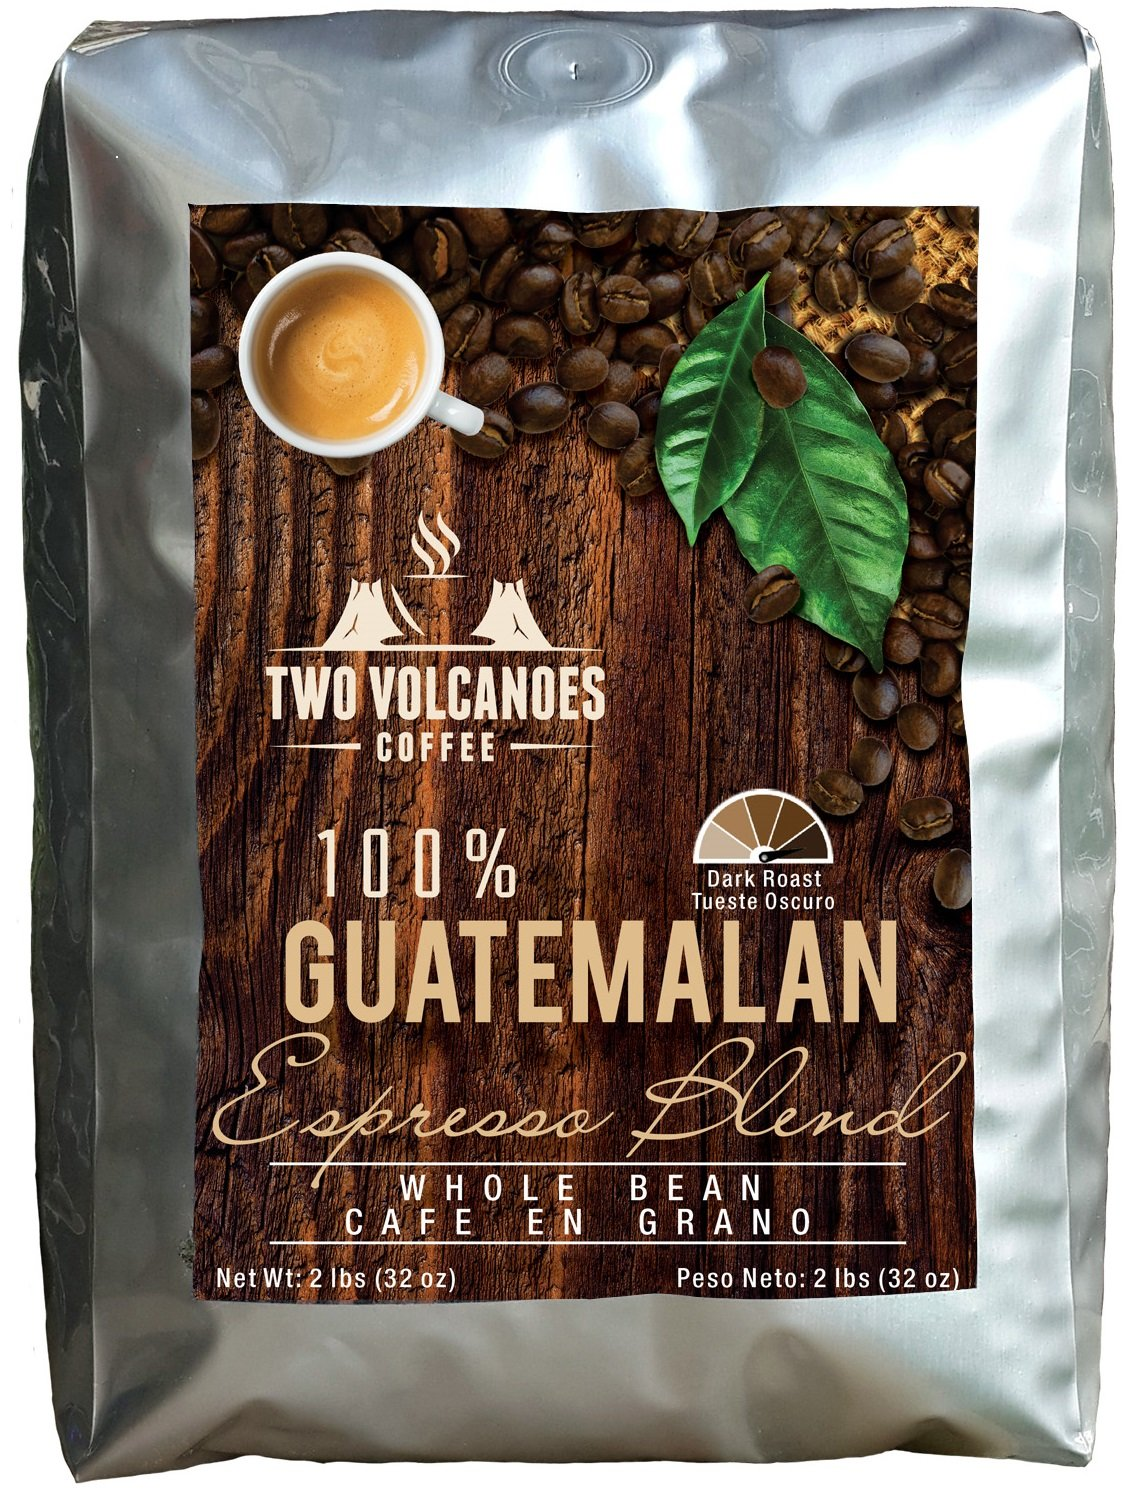 Best Organic Coffee Beans (2020 Picks) - Top 13 Brands ...